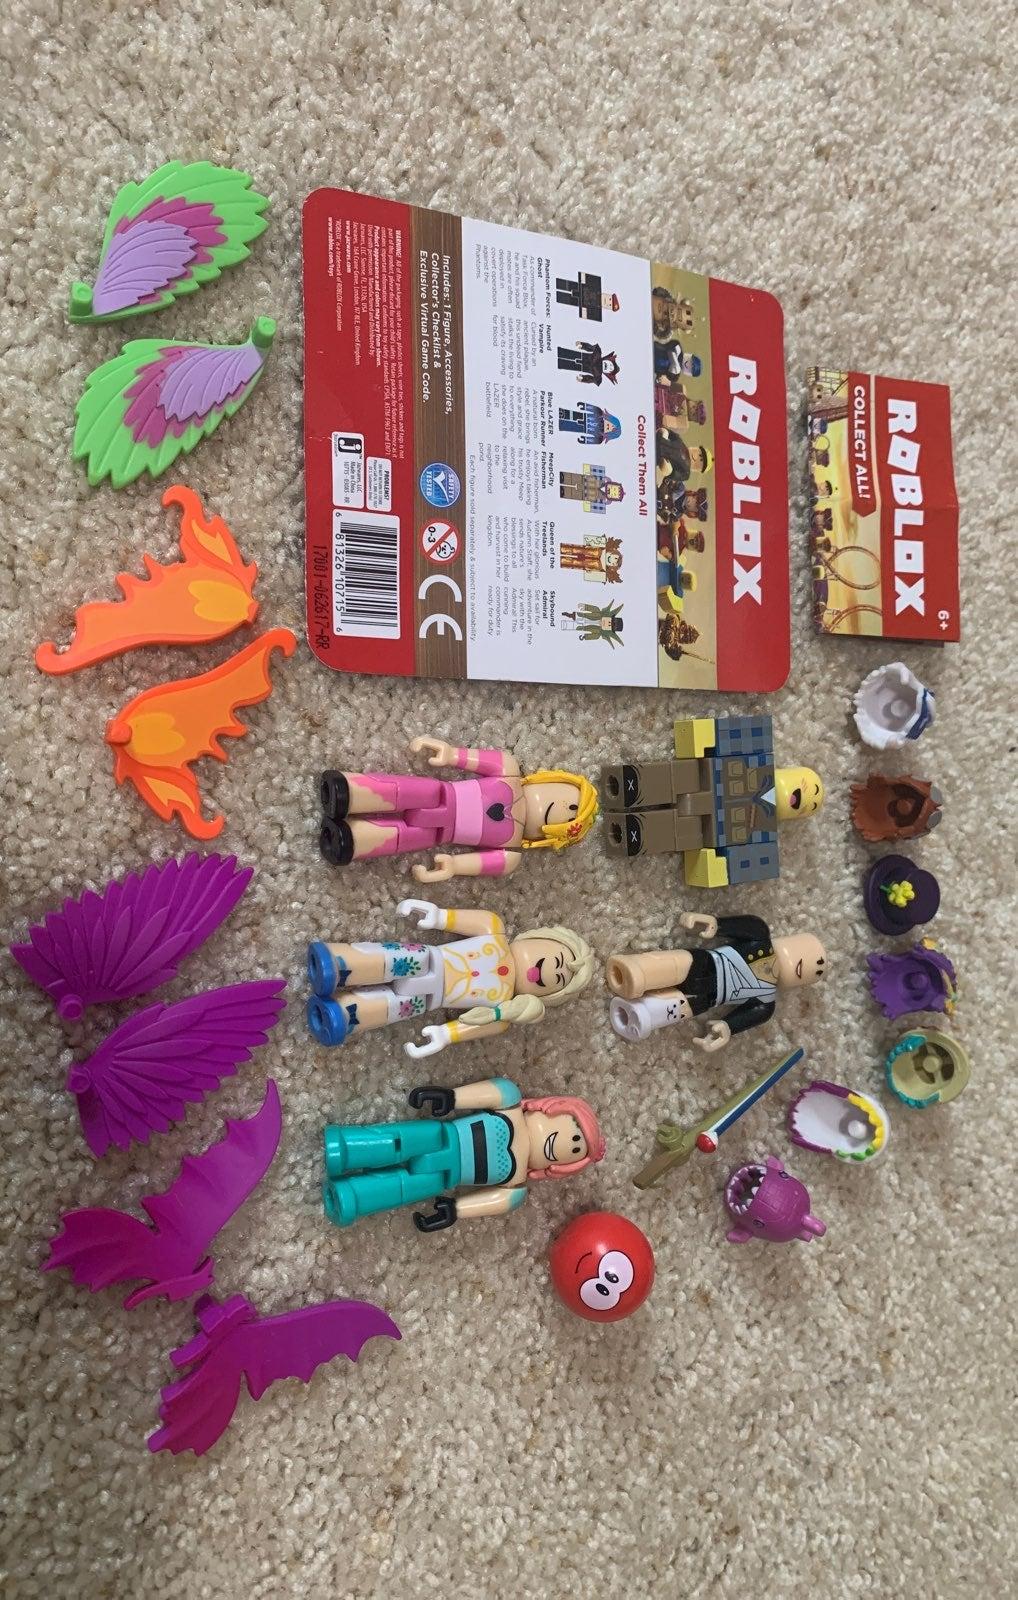 Bundle of Roblox Figurines